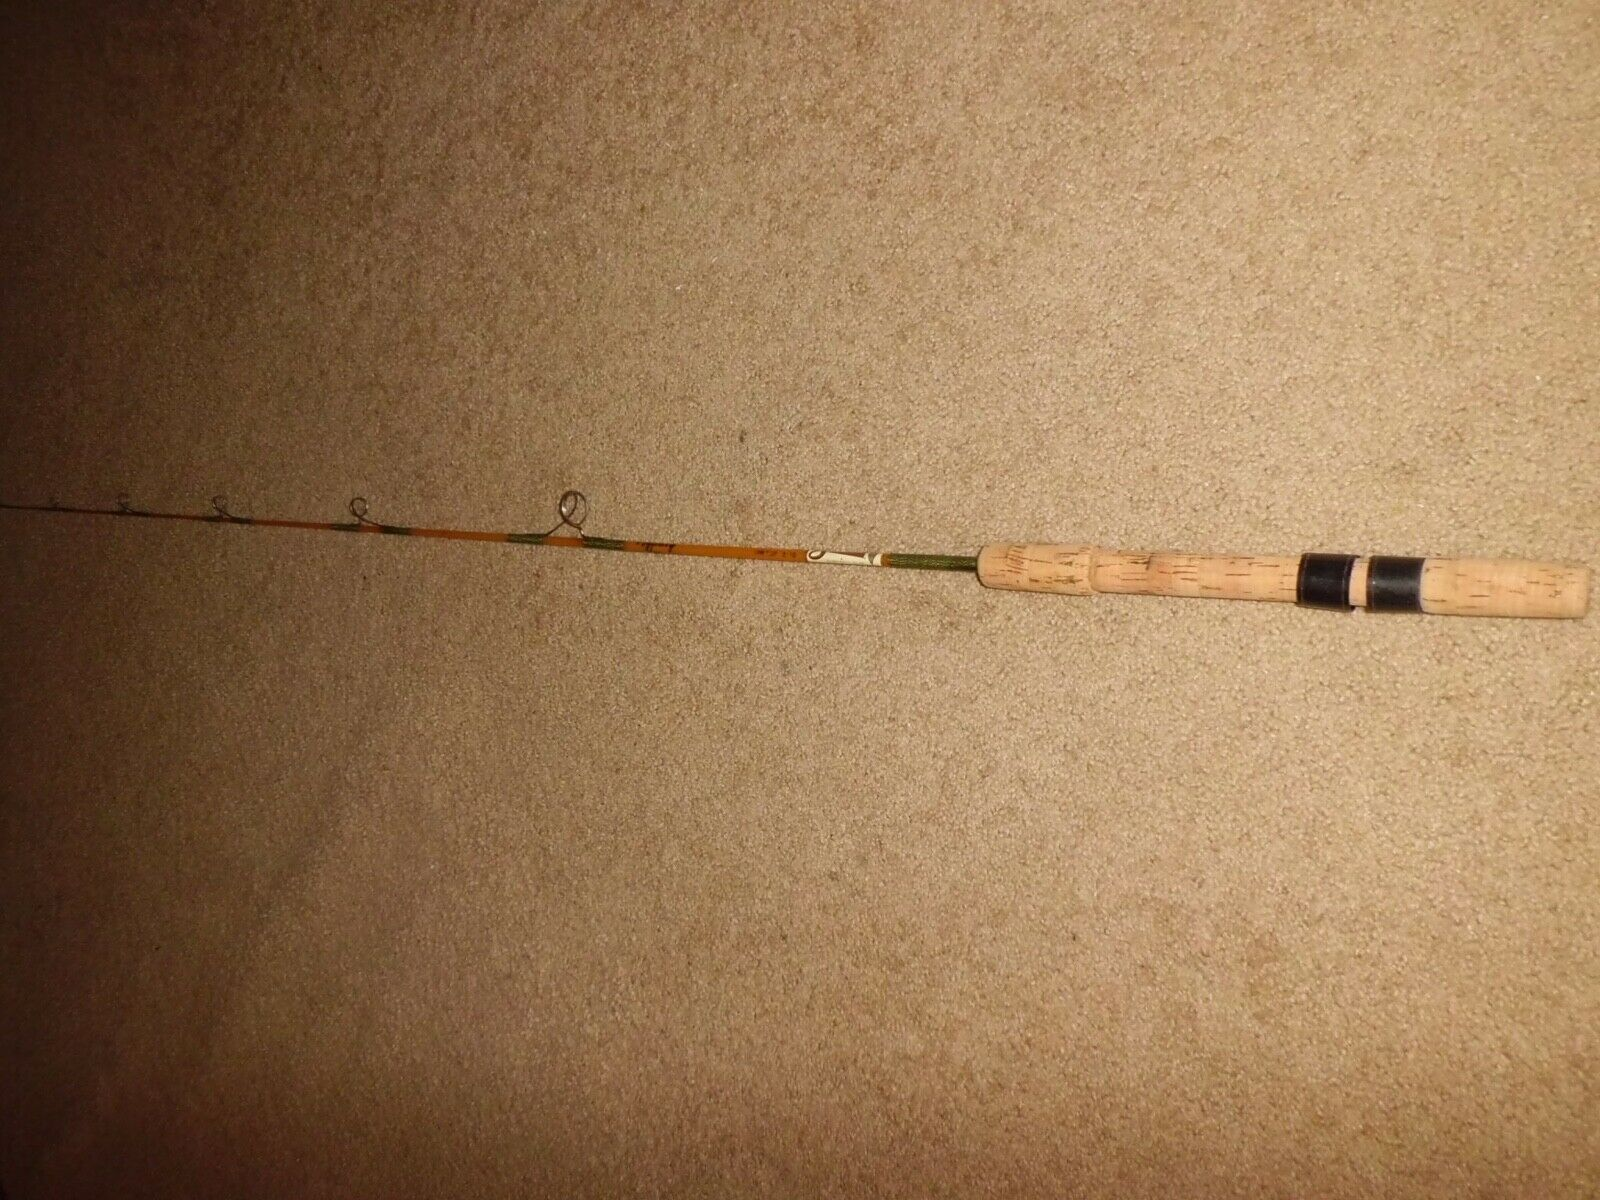 Vintage oroen Sabre nypoxy  1115 ul Spinning 5-1 2' Rod-EE. UU. - 2-10lb Test